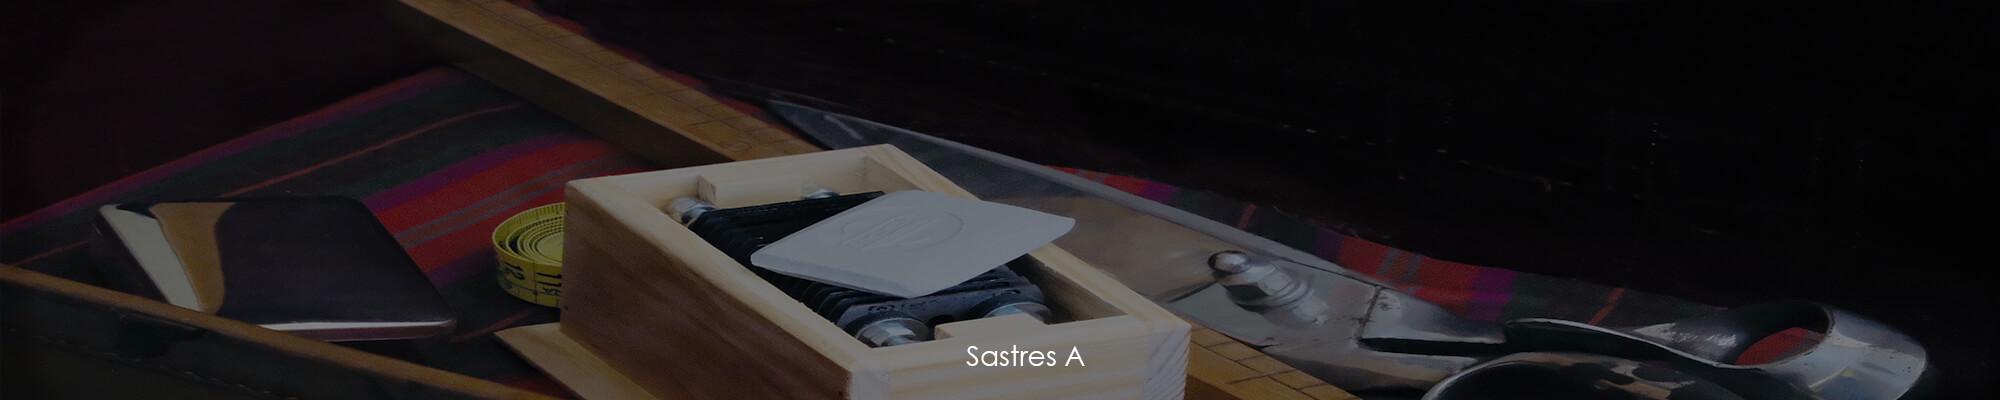 slide-sastresa2